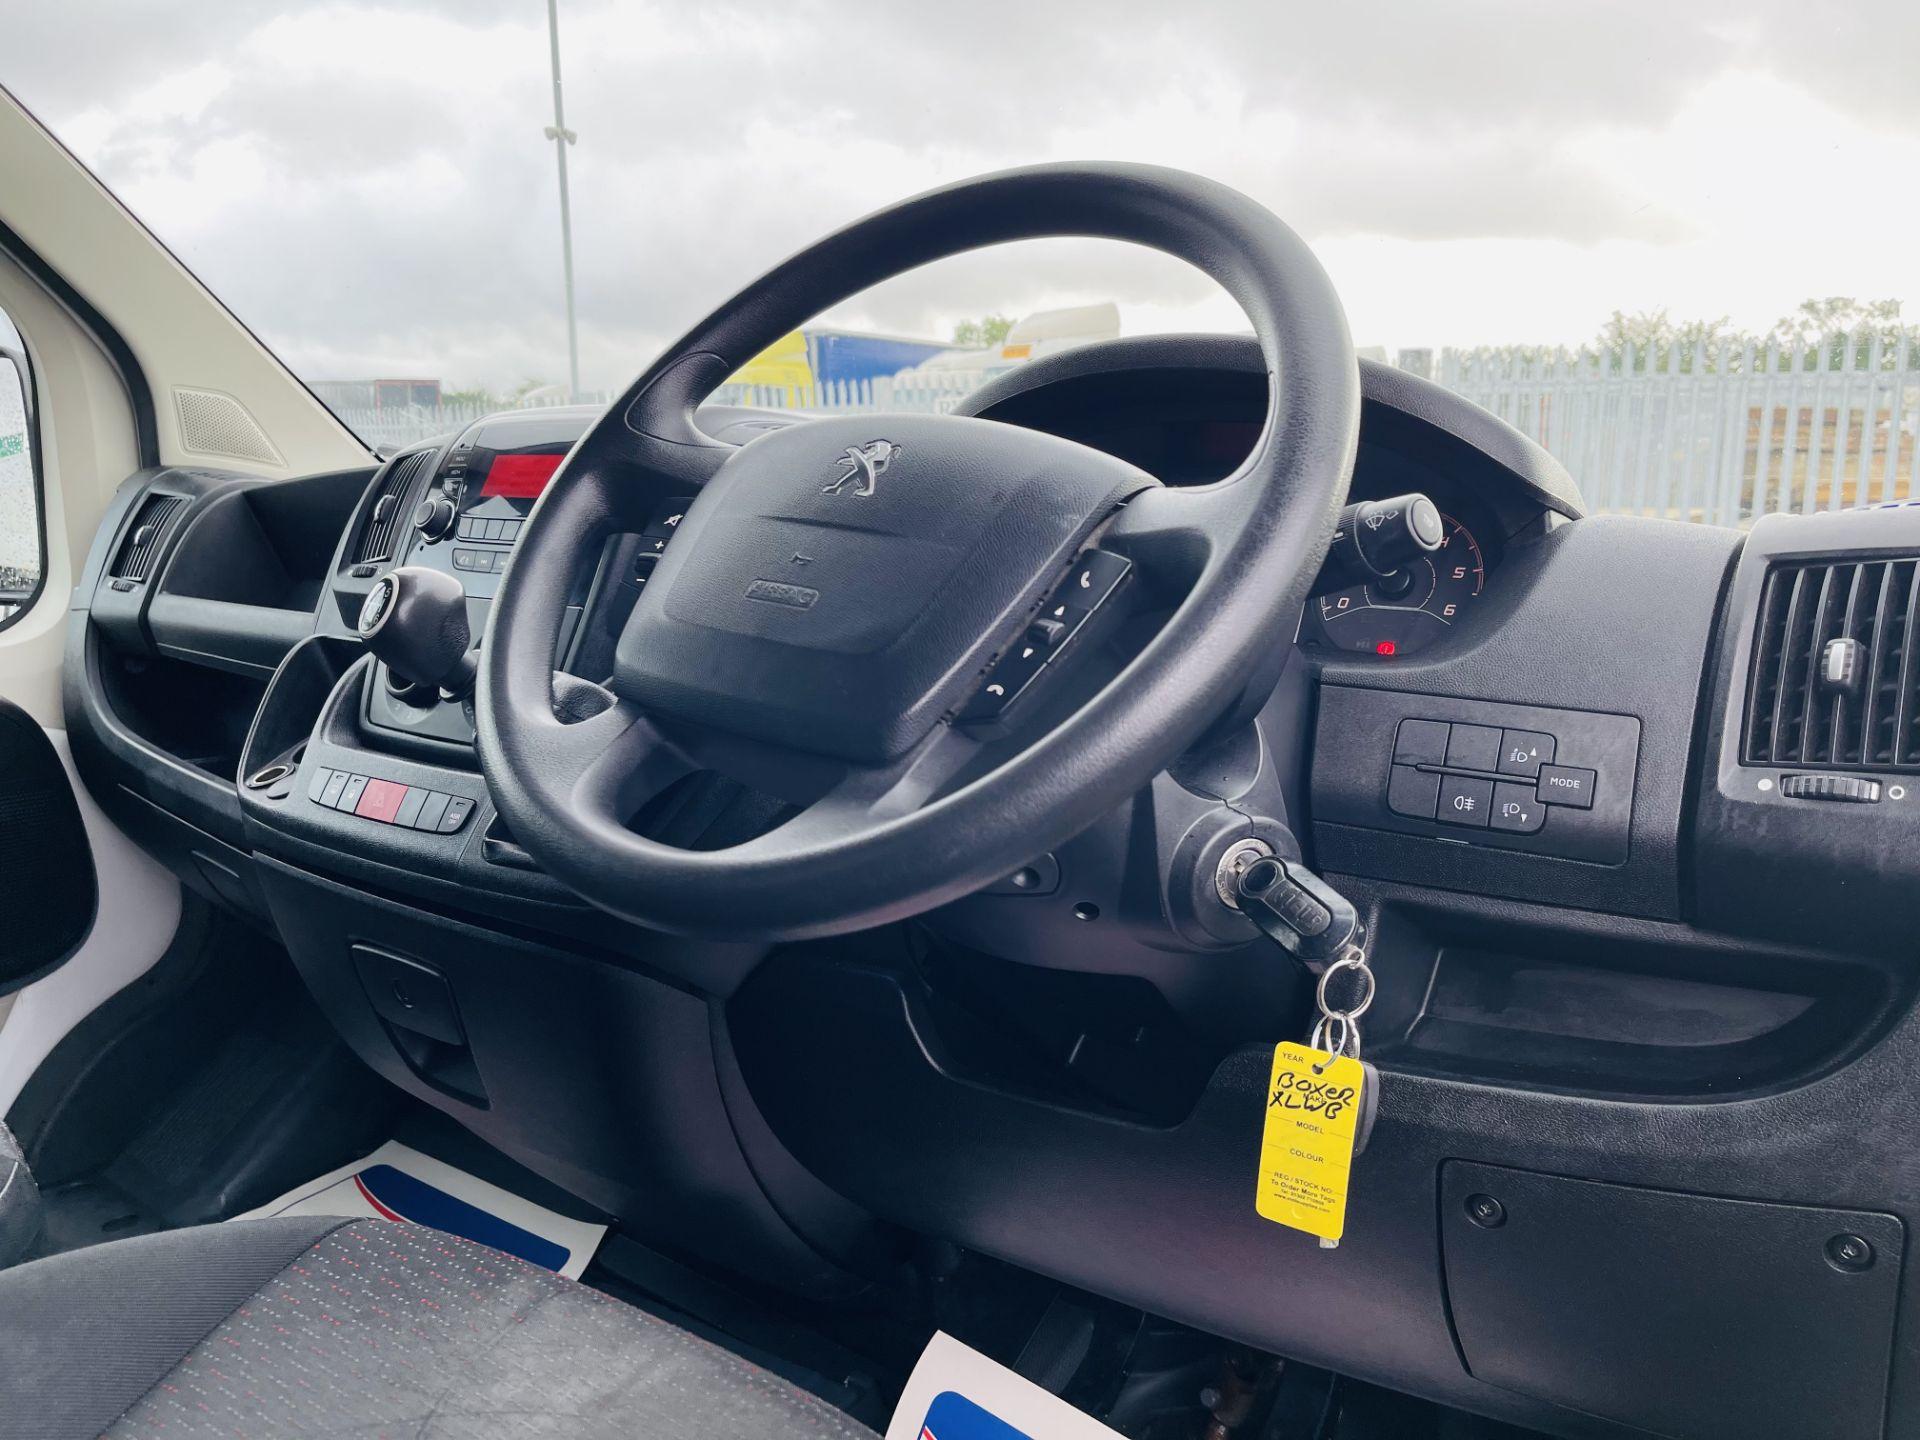 ** ON SALE ** Peugeot Boxer 2.0 BlueHDI L4 H3 2017 '66 Reg' Panel Van - LCV - Euro 6b ULEZ Compliant - Image 16 of 18